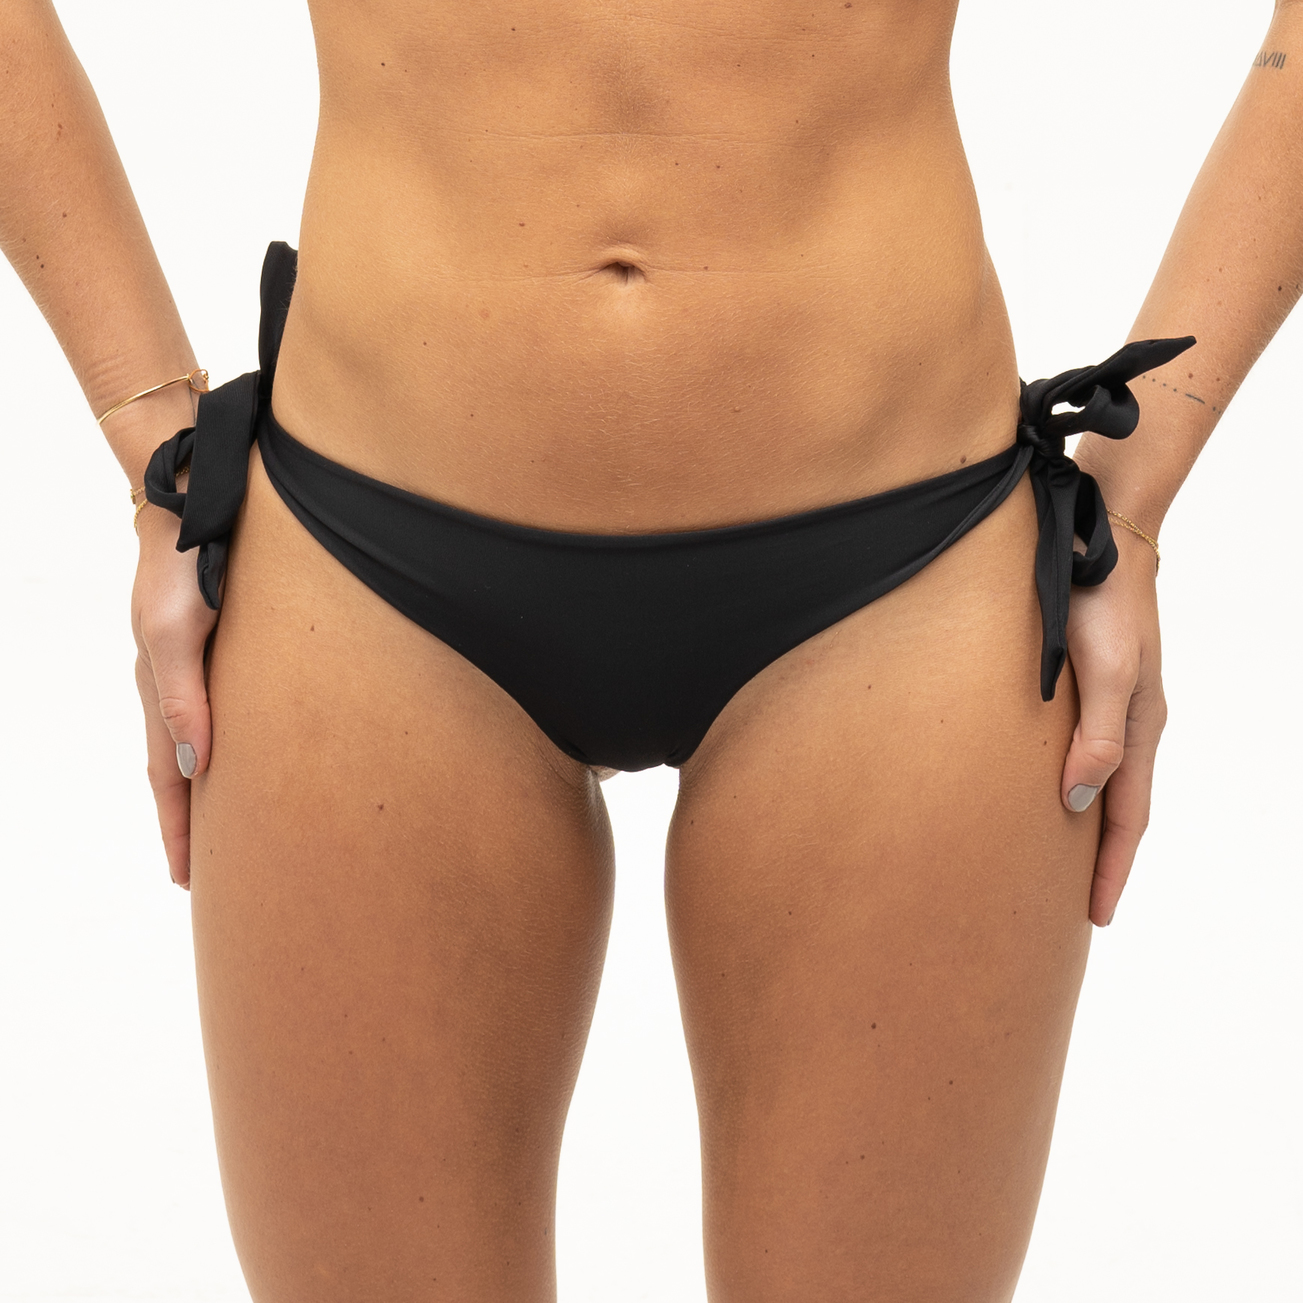 Seamless black bikini bottom with bows